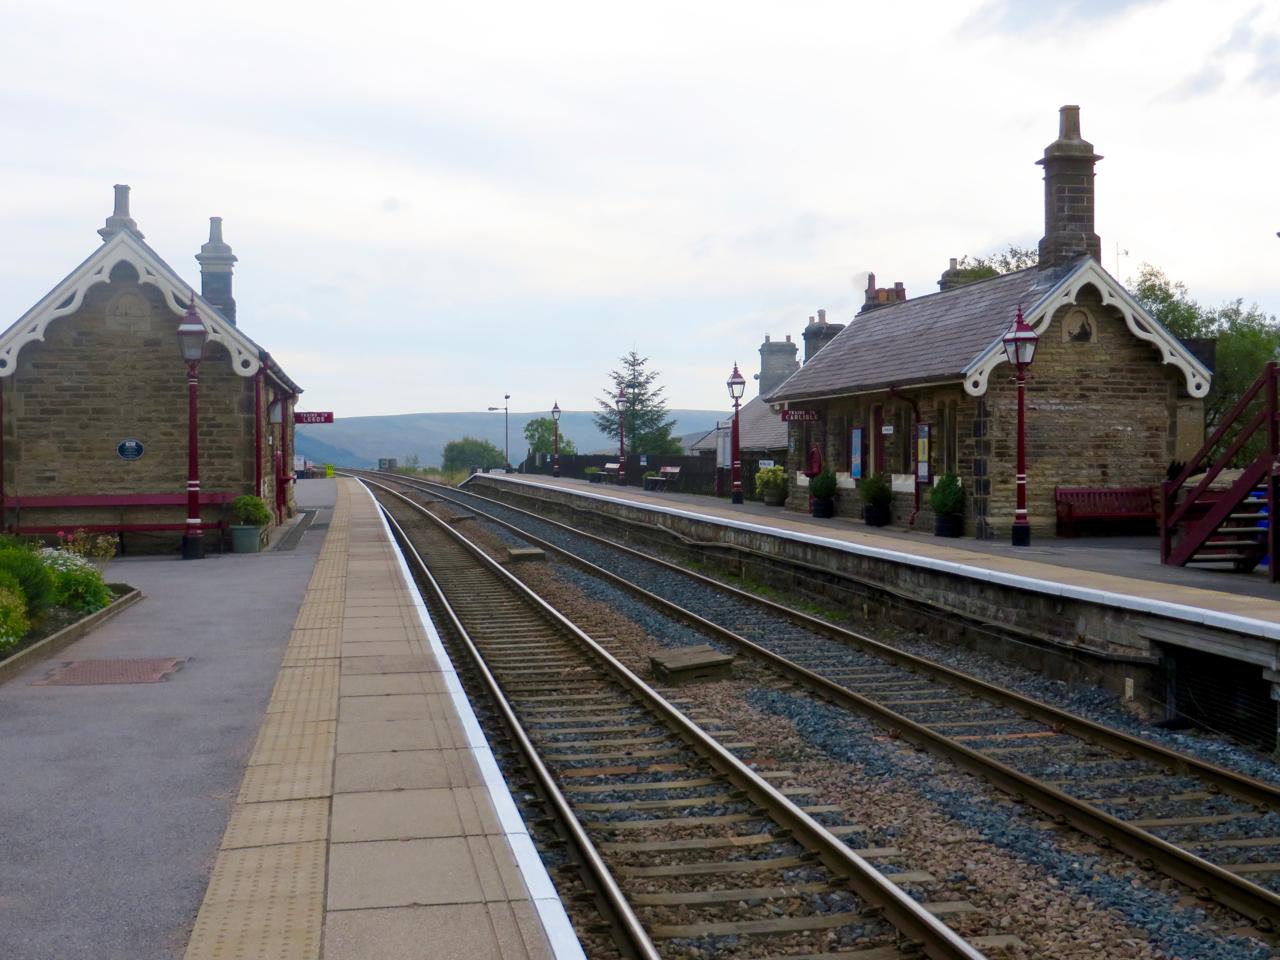 Garsdale Railway Station UK, near Wensleydale Cheese Experience